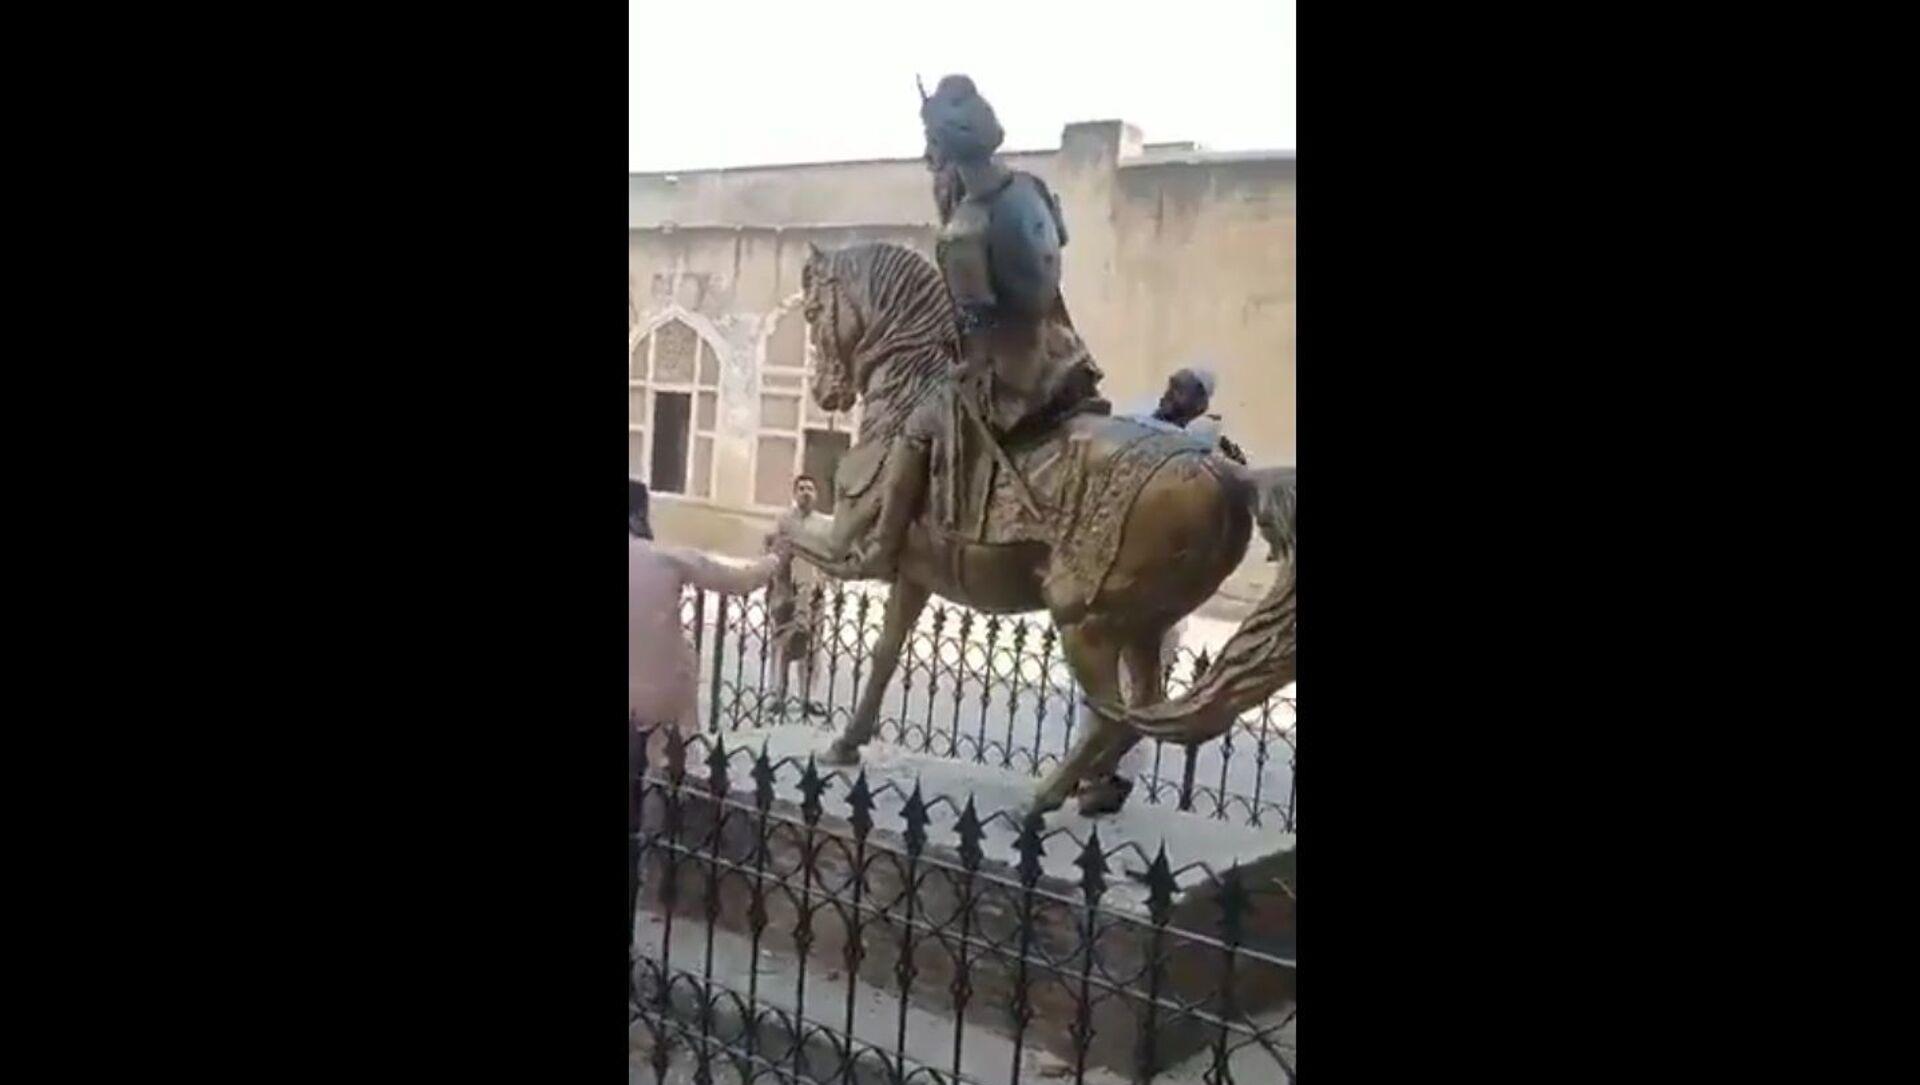 Maharaja Ranjit Singh's statue at Lahore fort is vandalised - Sputnik International, 1920, 17.08.2021